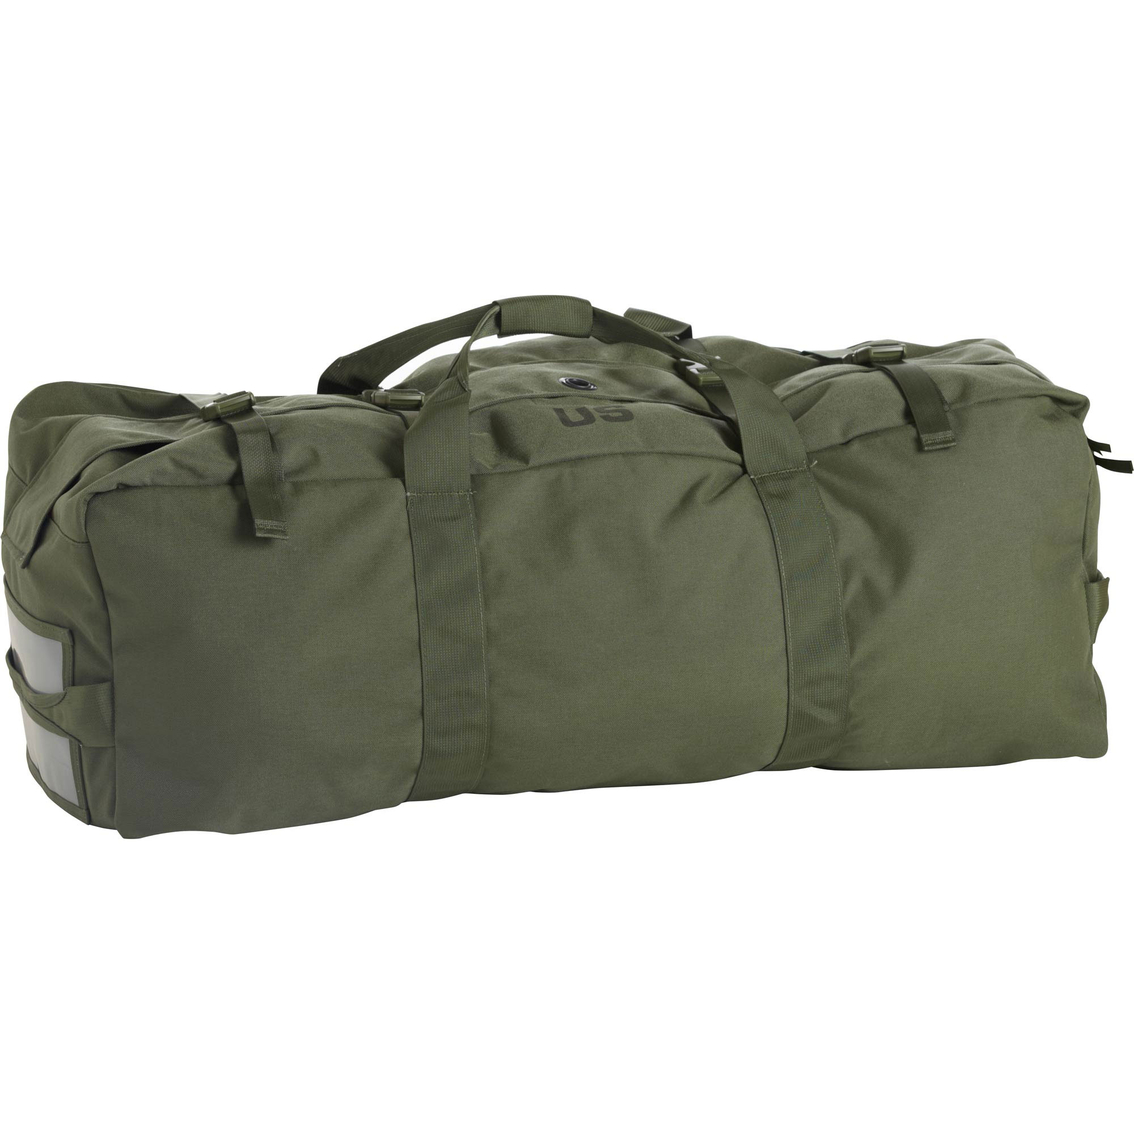 Dlats Full Length Zipper Duffel Bag Duffels Amp Suitcases